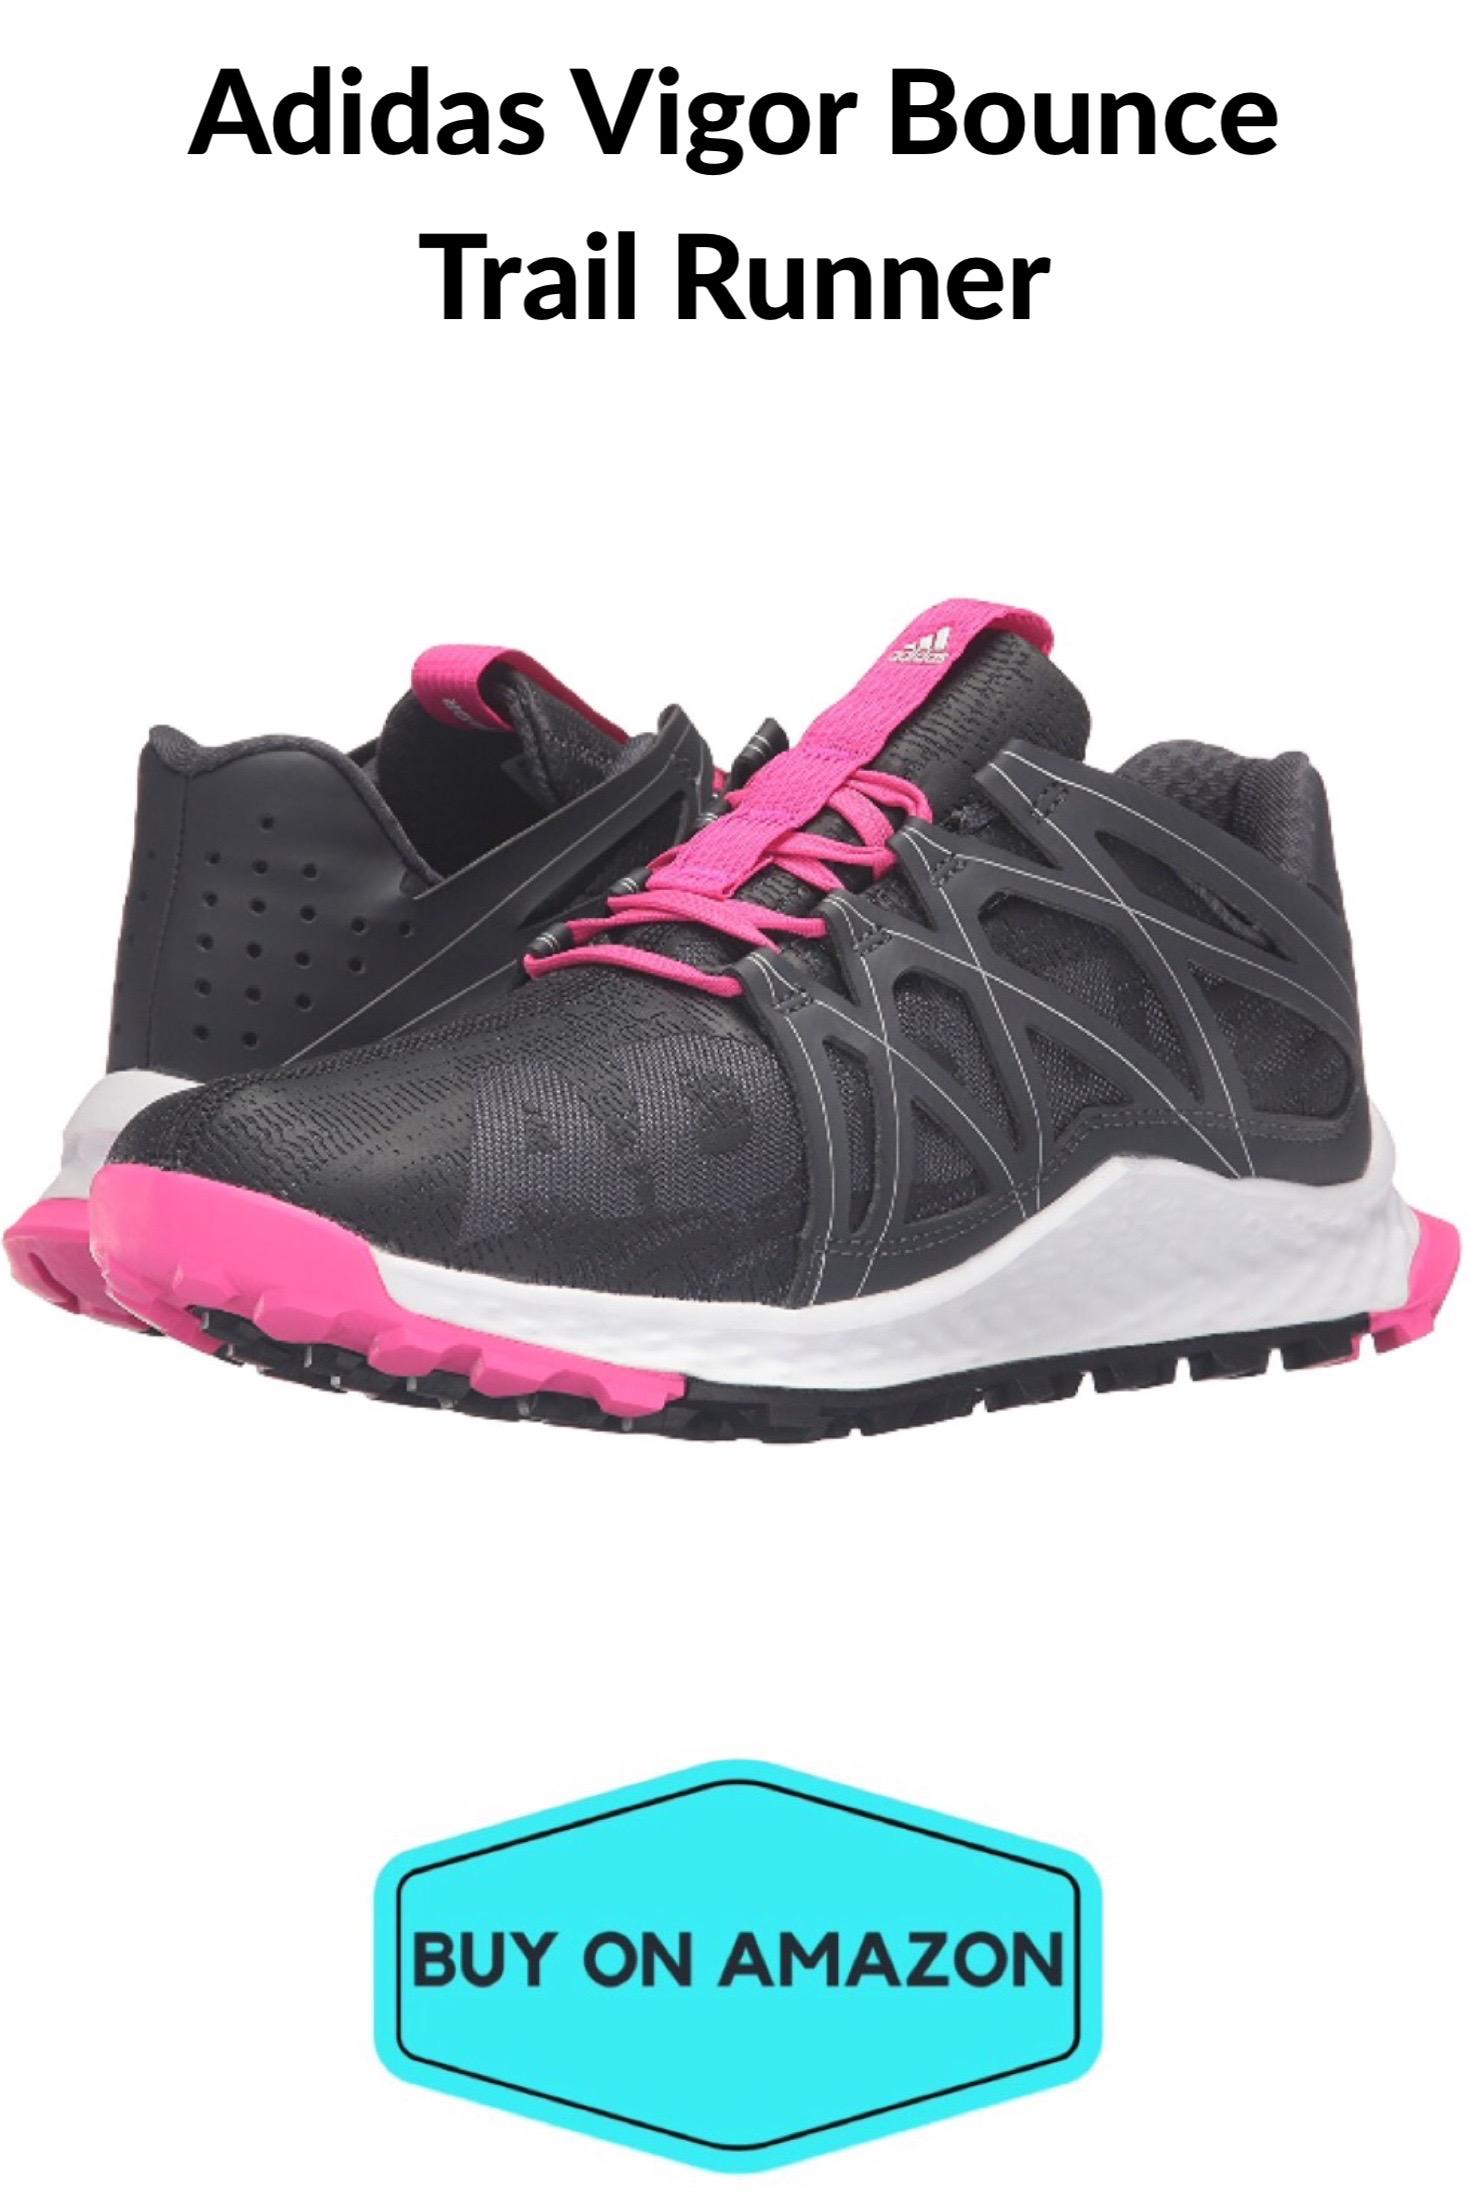 Adidas Vigor Bounce Women's Trail Runner